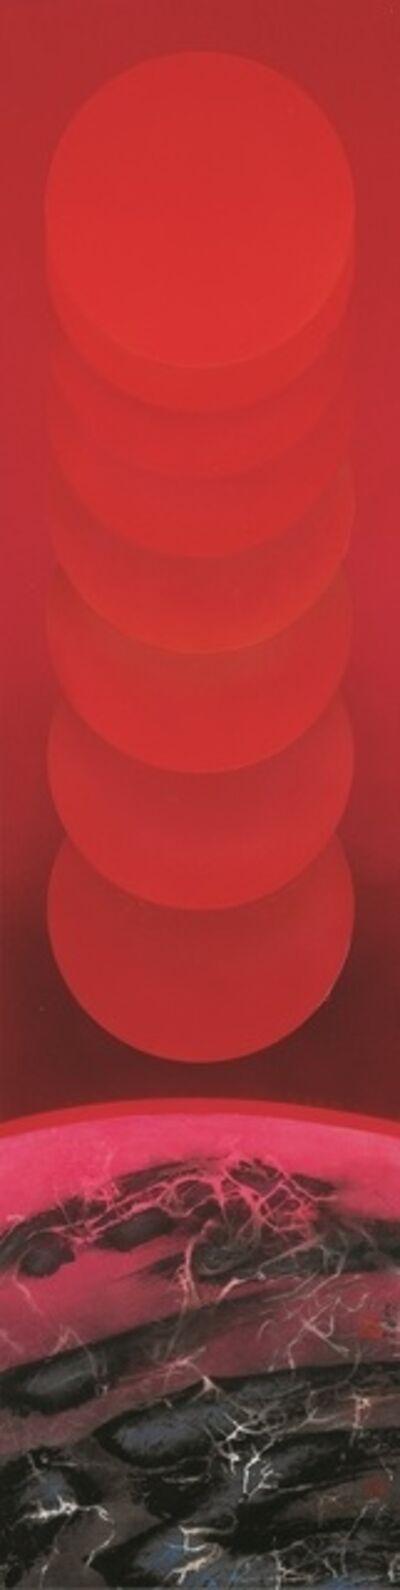 Liu Kuo-sung 刘国松, 'The Feeling of Sunrise 日升的感覺', 2008